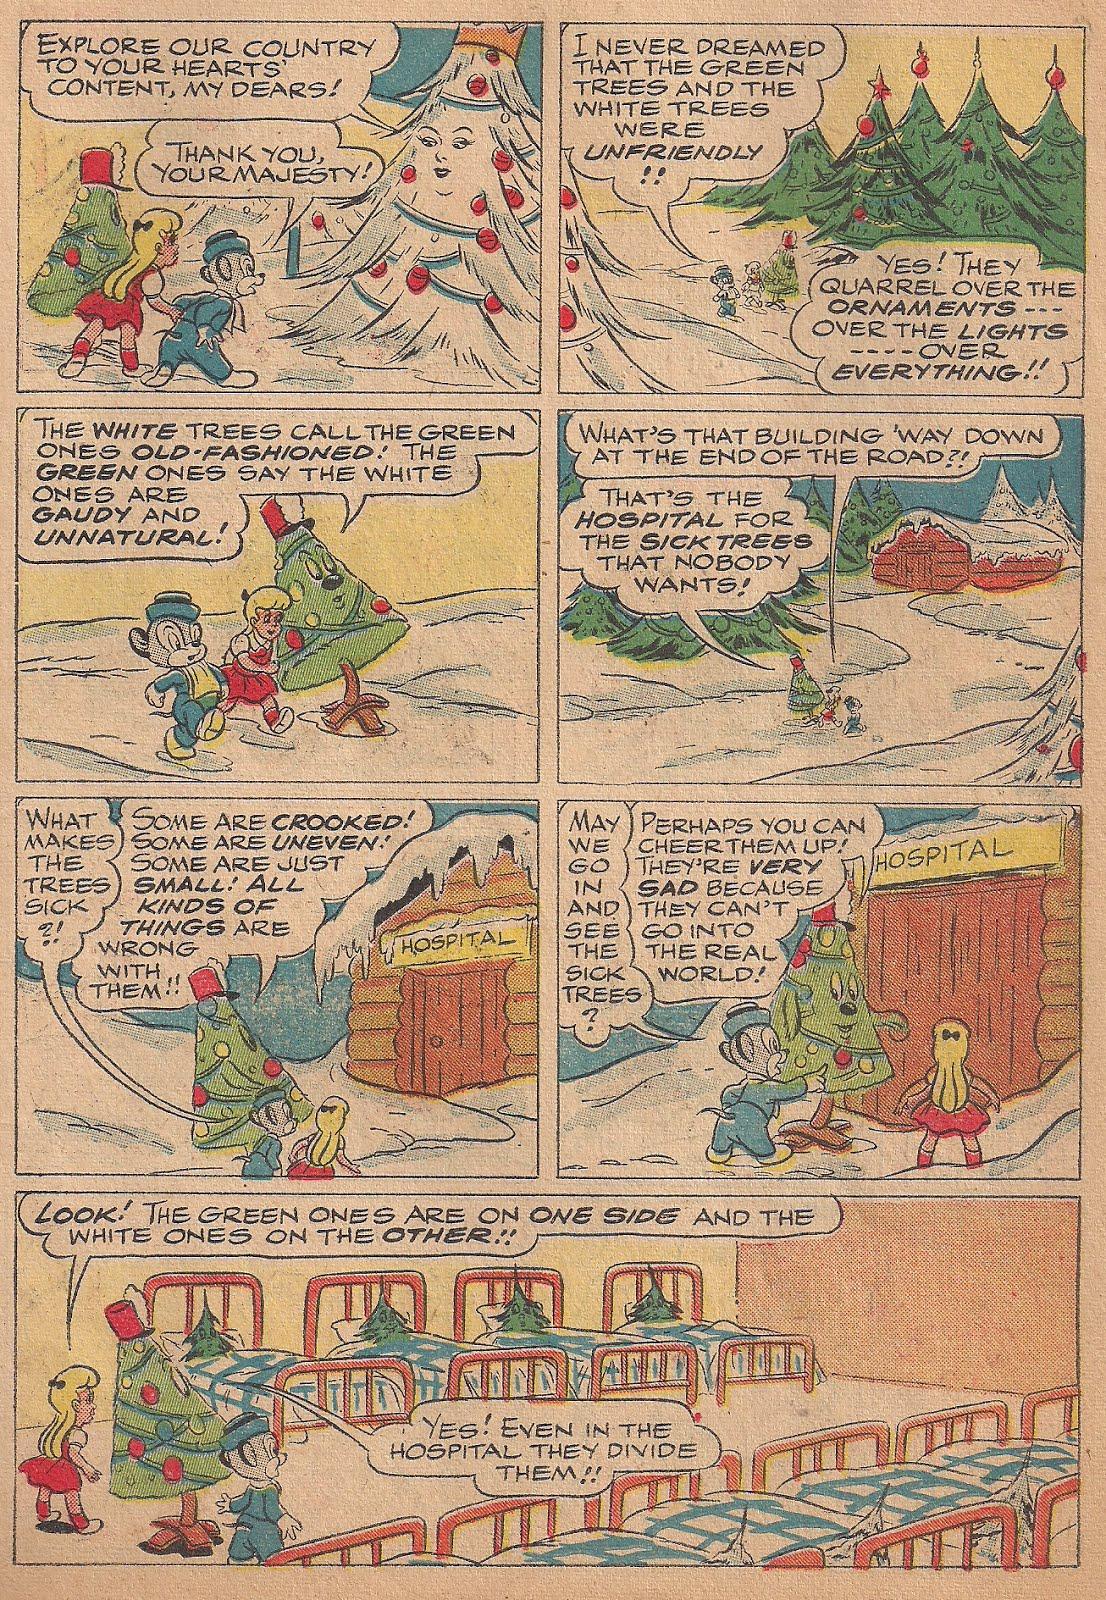 Amazoncom: Looney Tunes - Sylvester and Tweety Comic